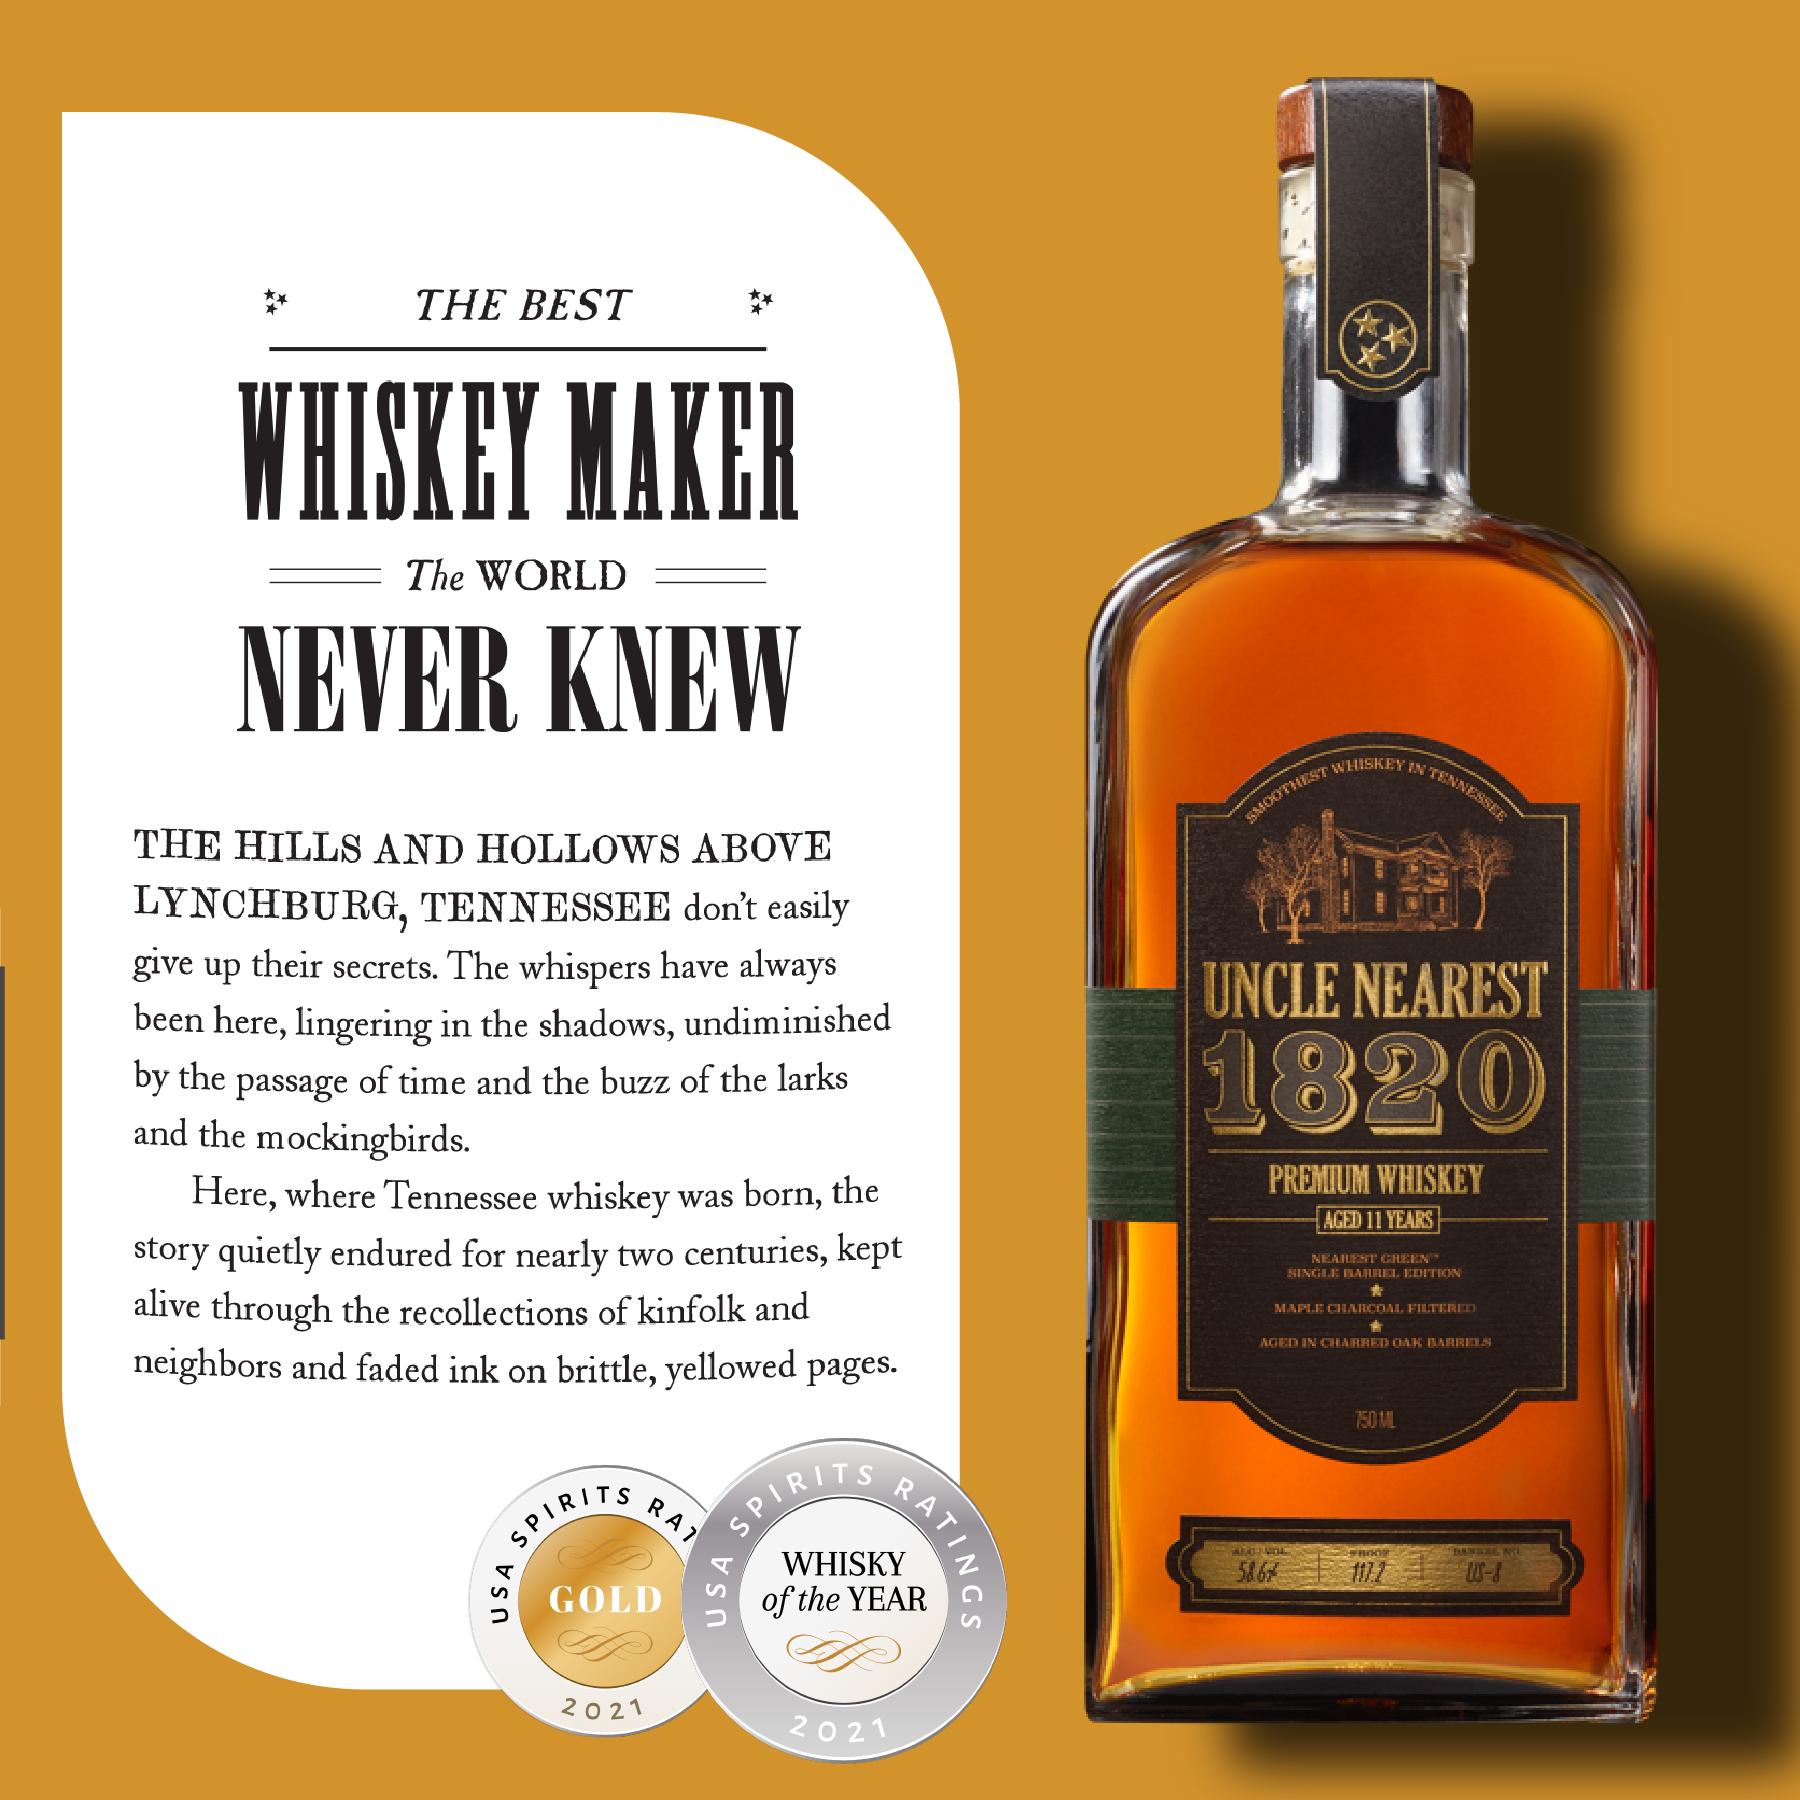 Uncle Nearest 1820 Premium Single Barrel Whiskey - US-53